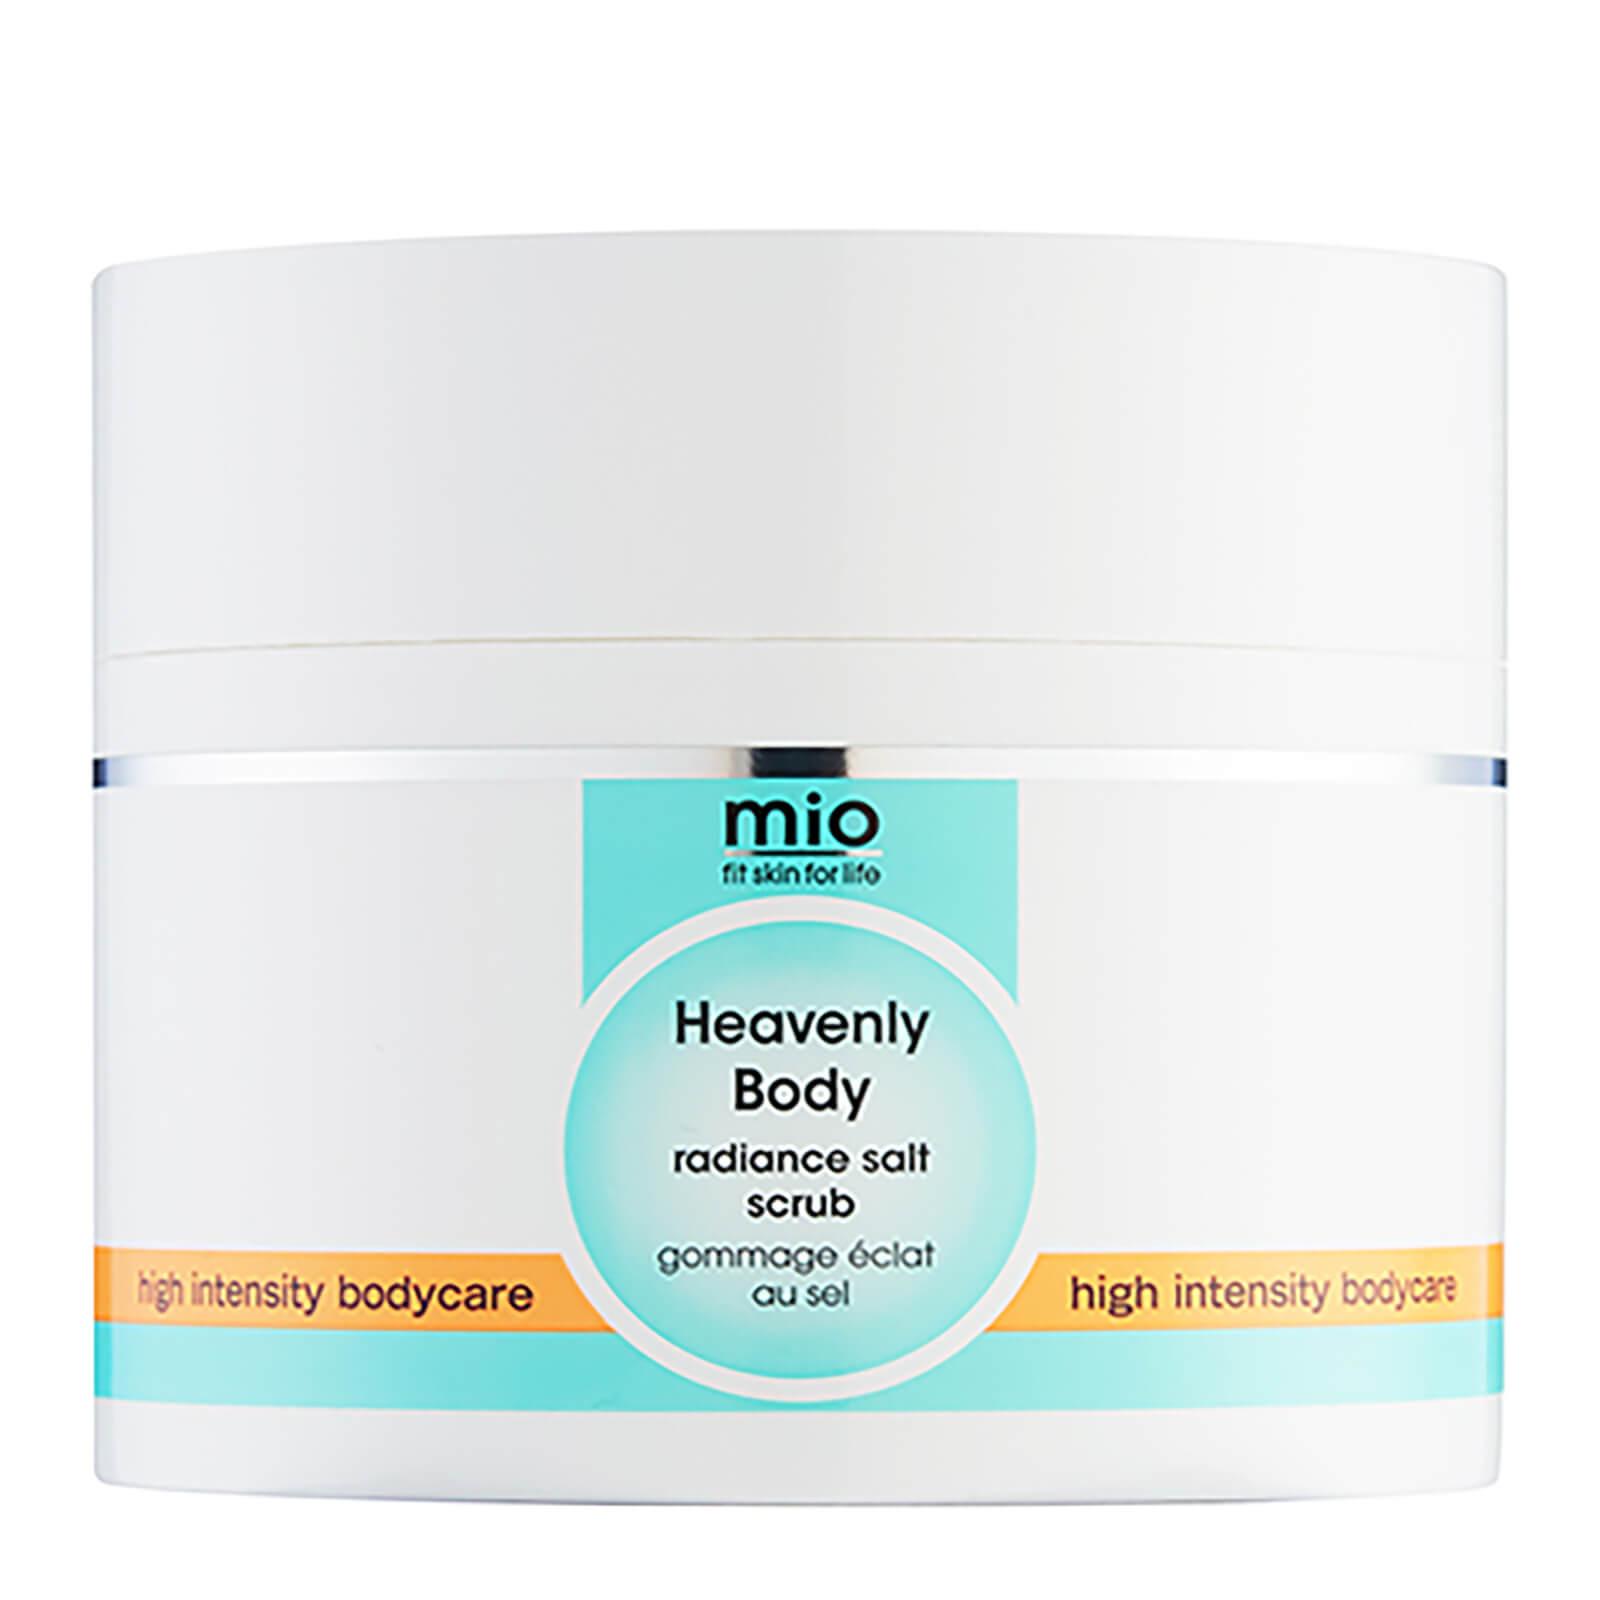 Mitac Mio Skincare Heavenly Body Radiance Salt Scrub 300g